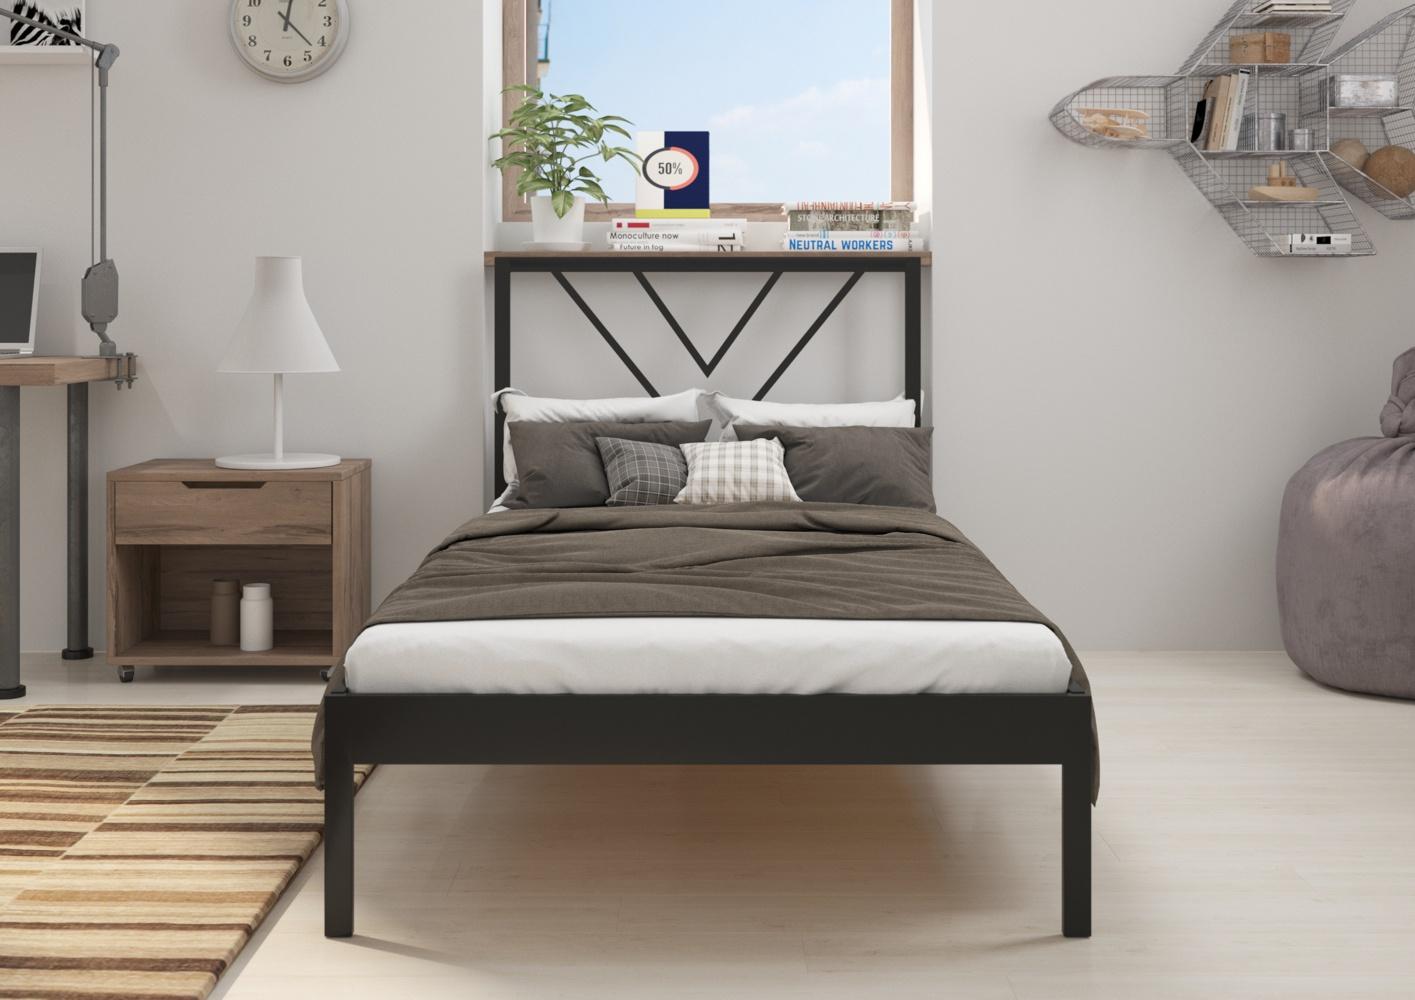 Łóżko metalowe Sidney (wzór 5) (80-100 cm)